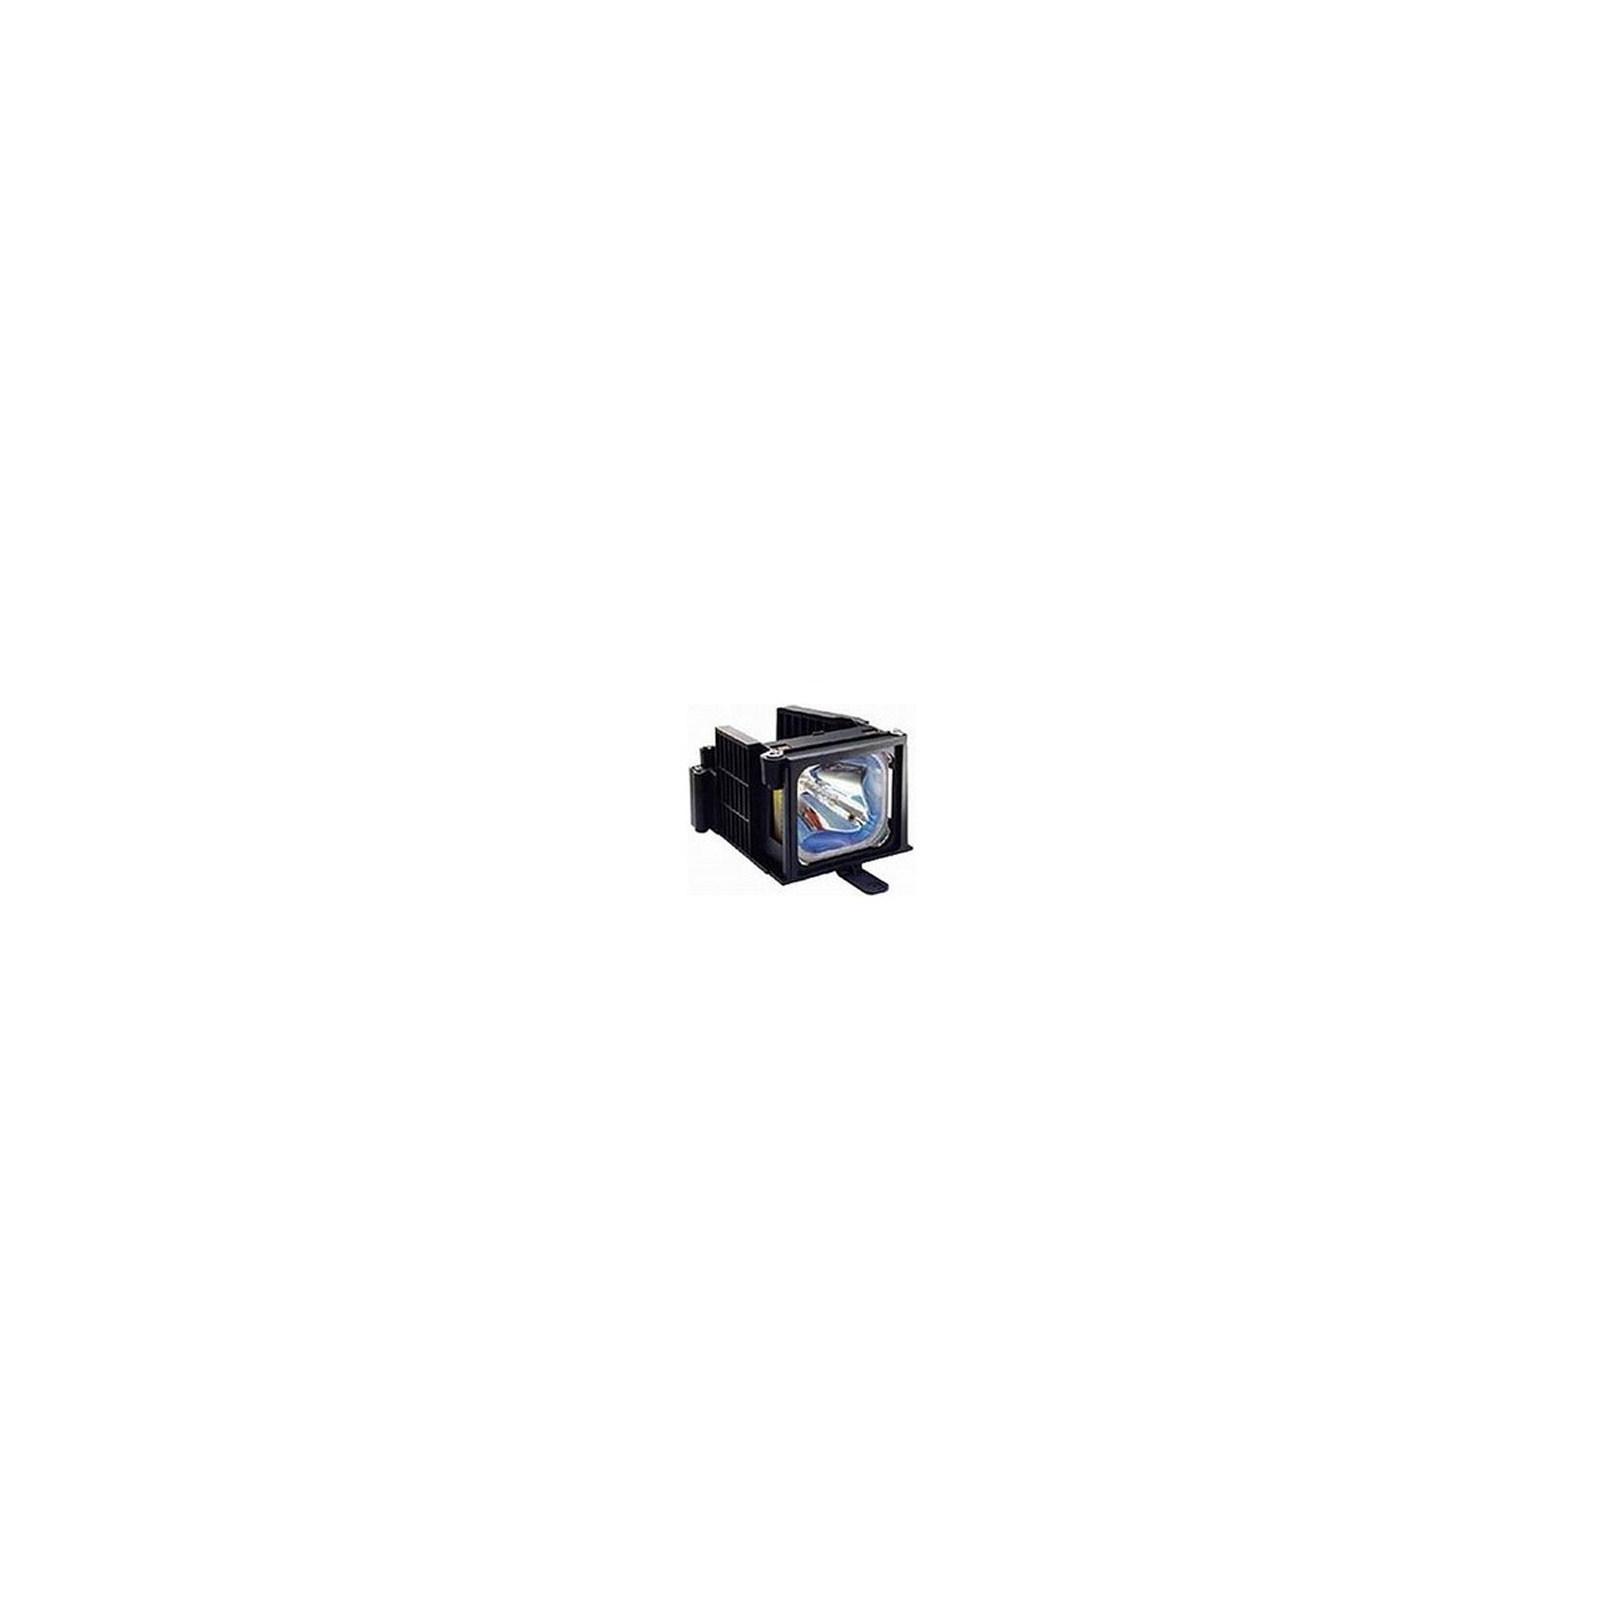 Лампа проектора Acer P5270/P5370W (EC.J5500.001)